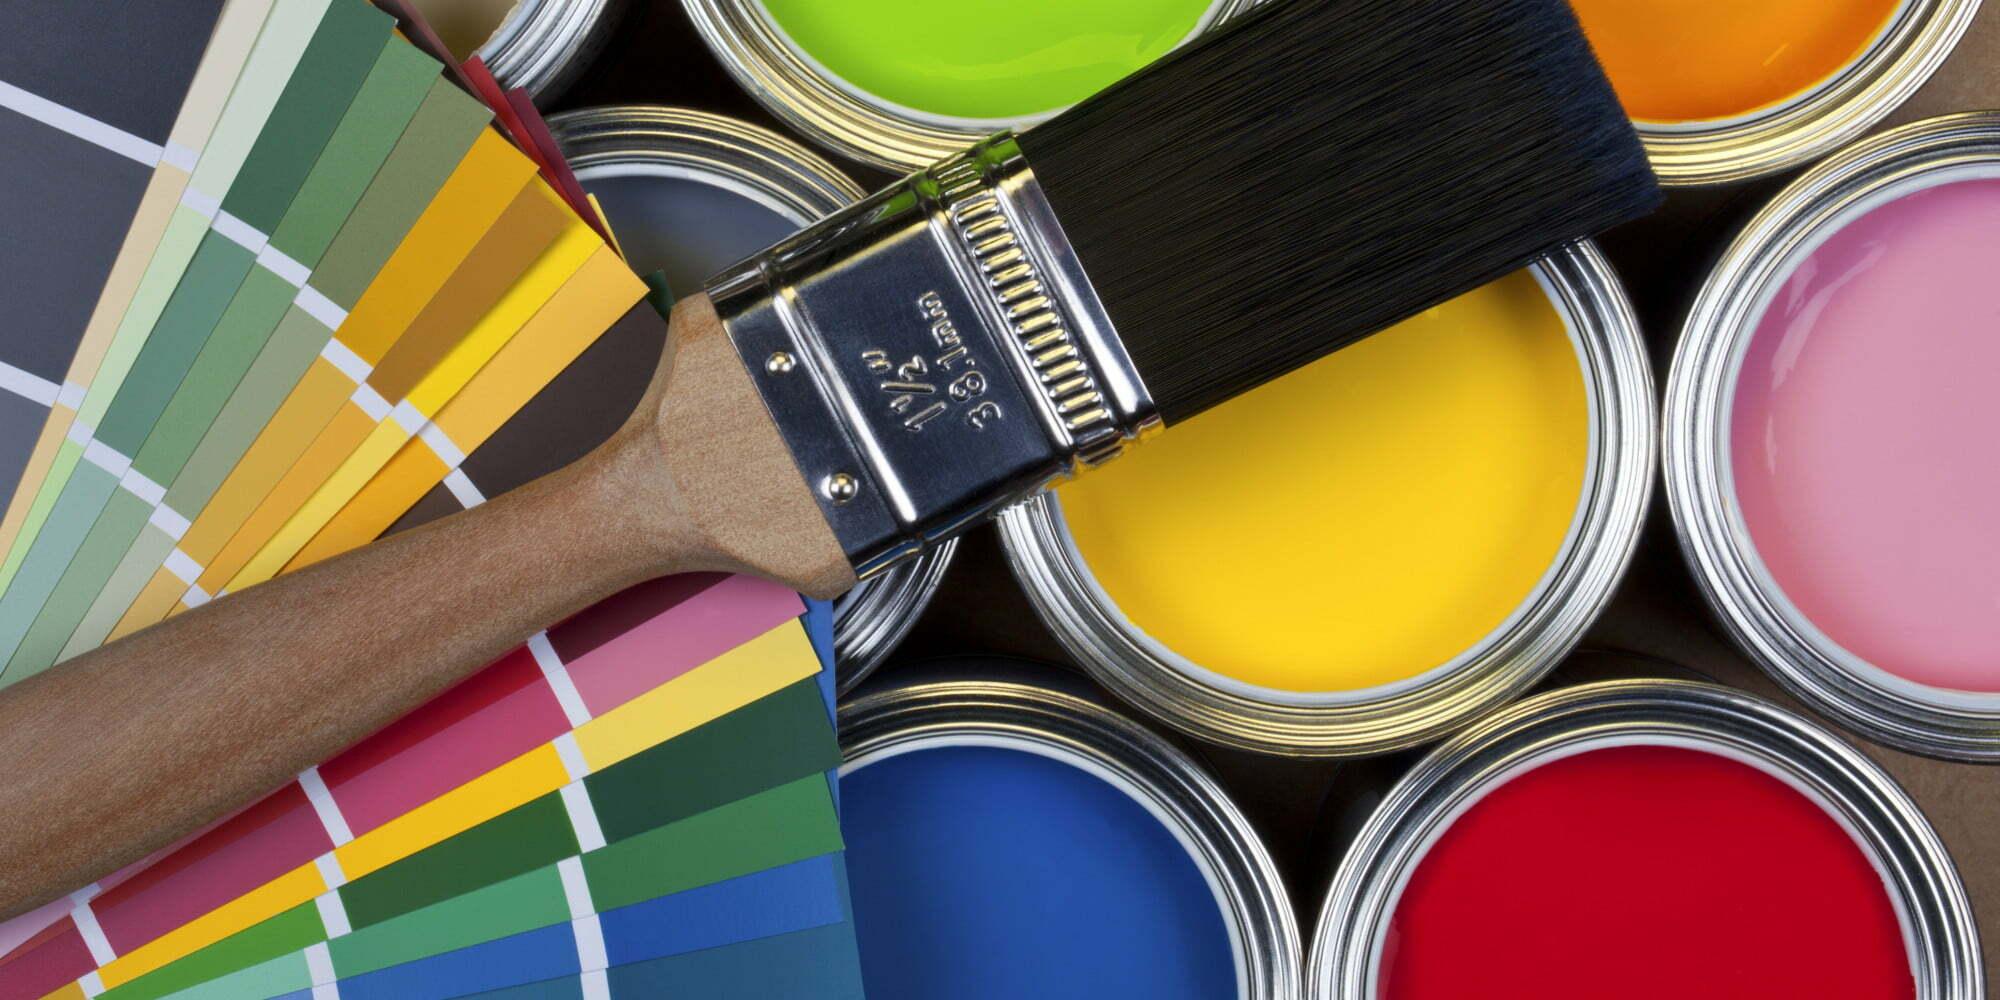 Best 20+ Kitchen Paint Color Ideas | Designs and Pictures ...